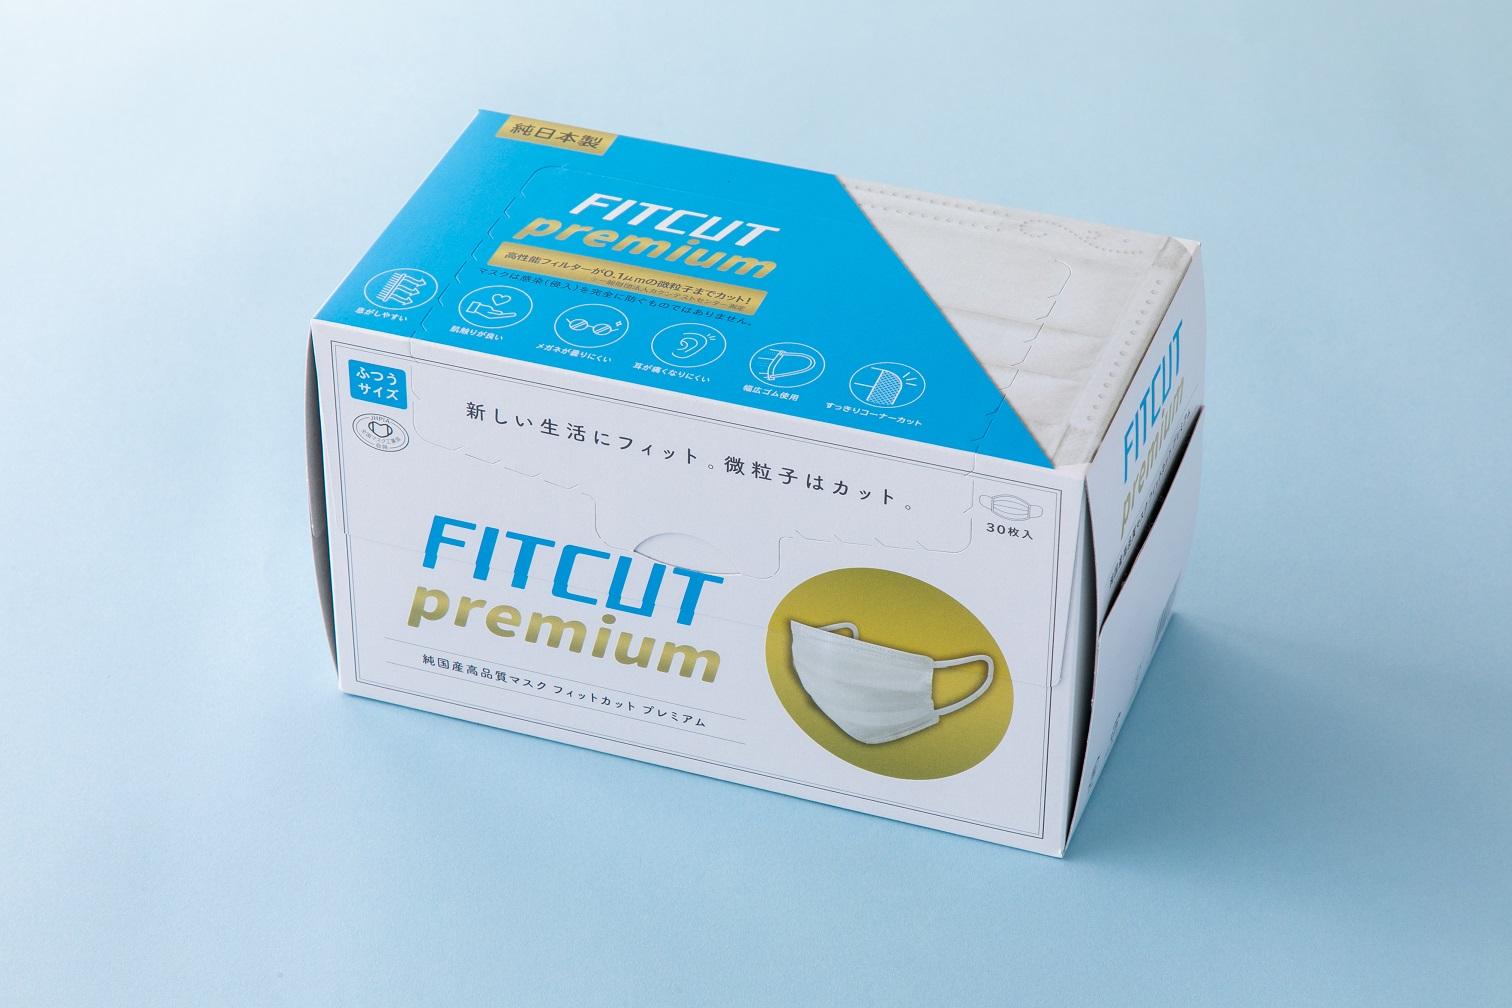 FITCUTプレミアム ふつうサイズ 30枚箱